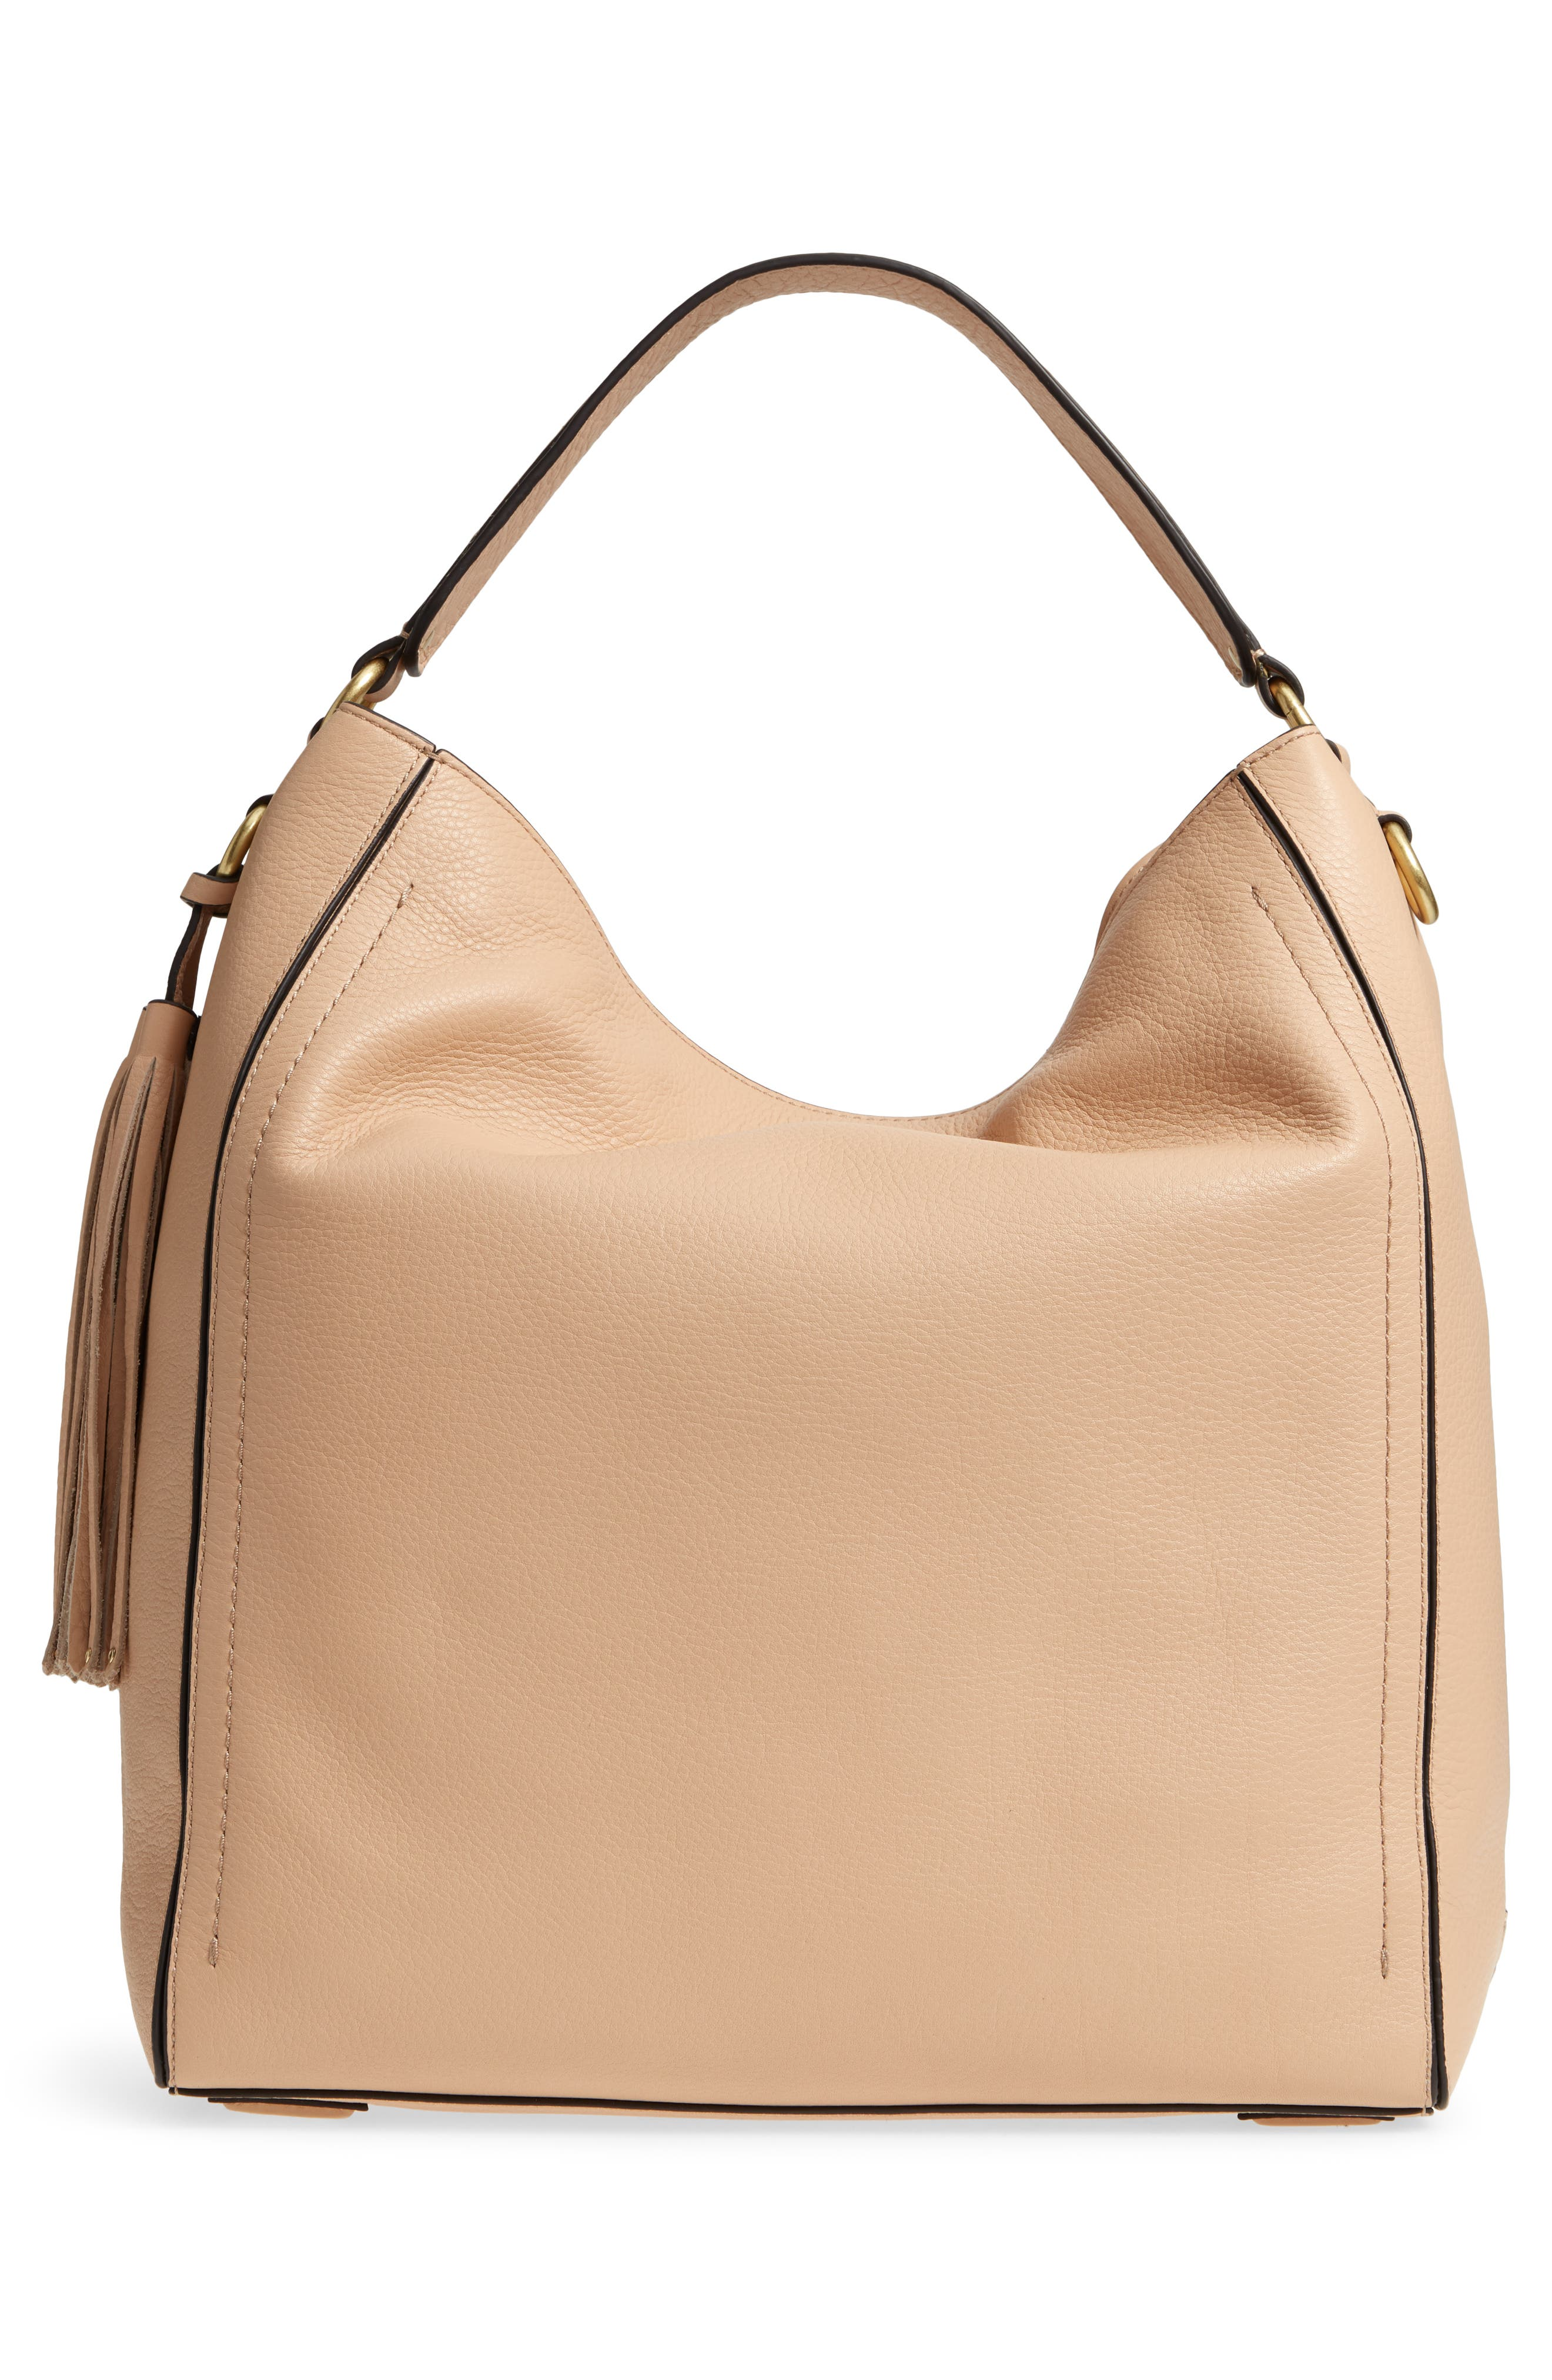 Cassidy RFID Pebbled Leather Bucket Bag,                             Alternate thumbnail 11, color,